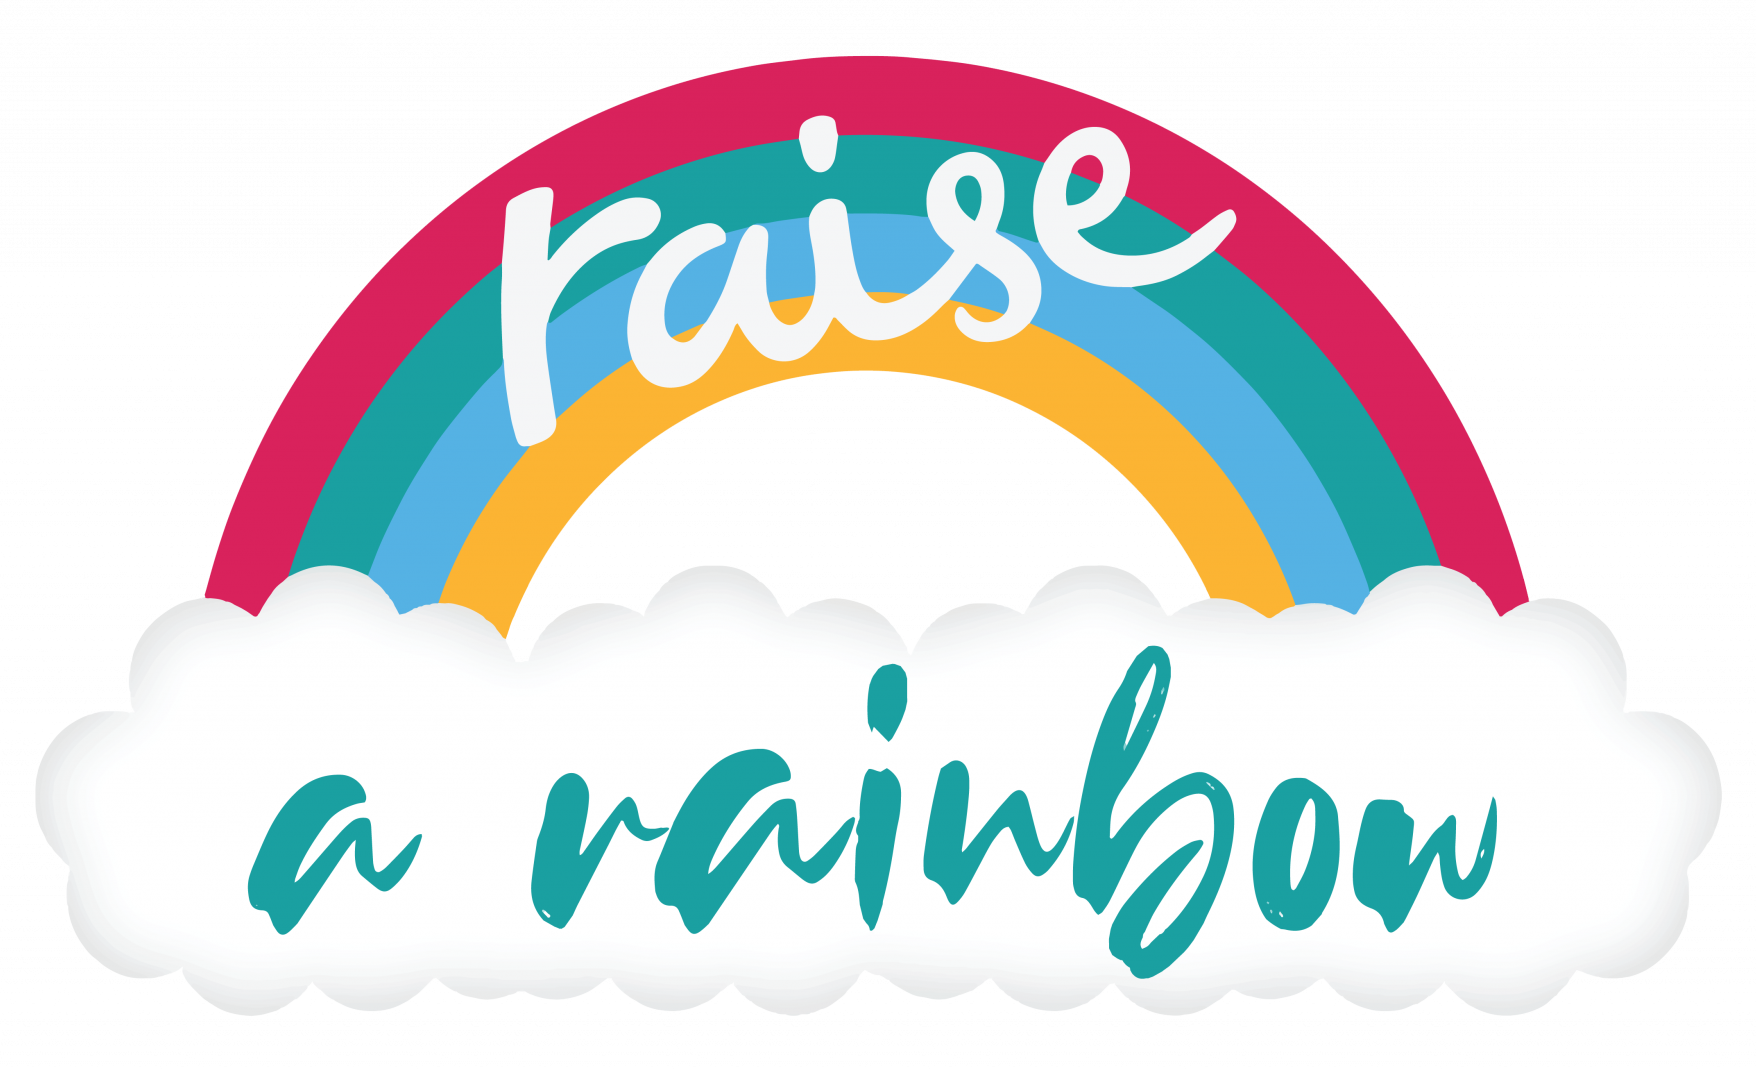 RaiseARainbow-HotPinkYellow9-Transparent-2048x1434